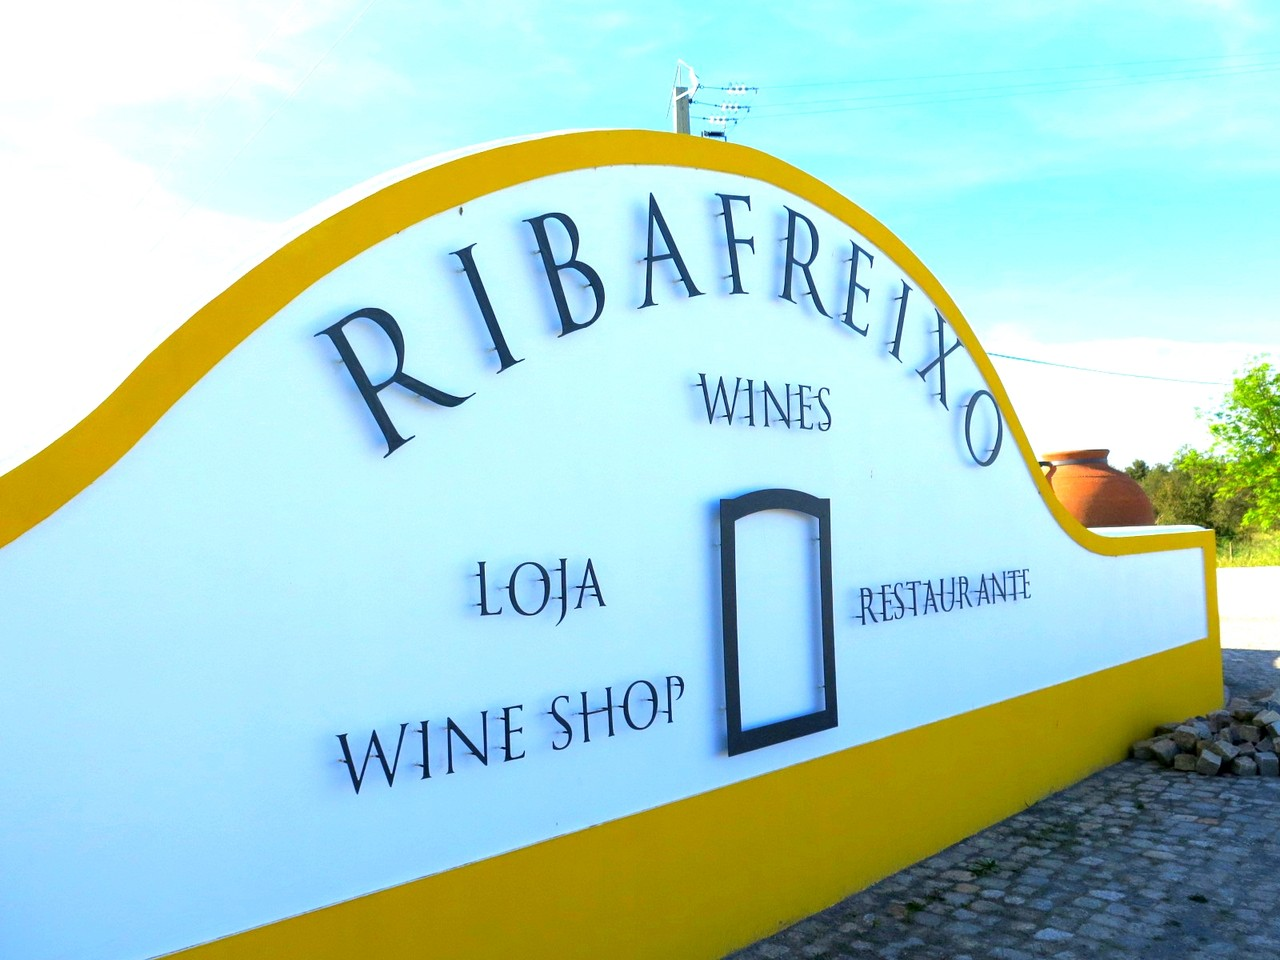 Ribafreixo Wines, enoturismo na Vidigueira